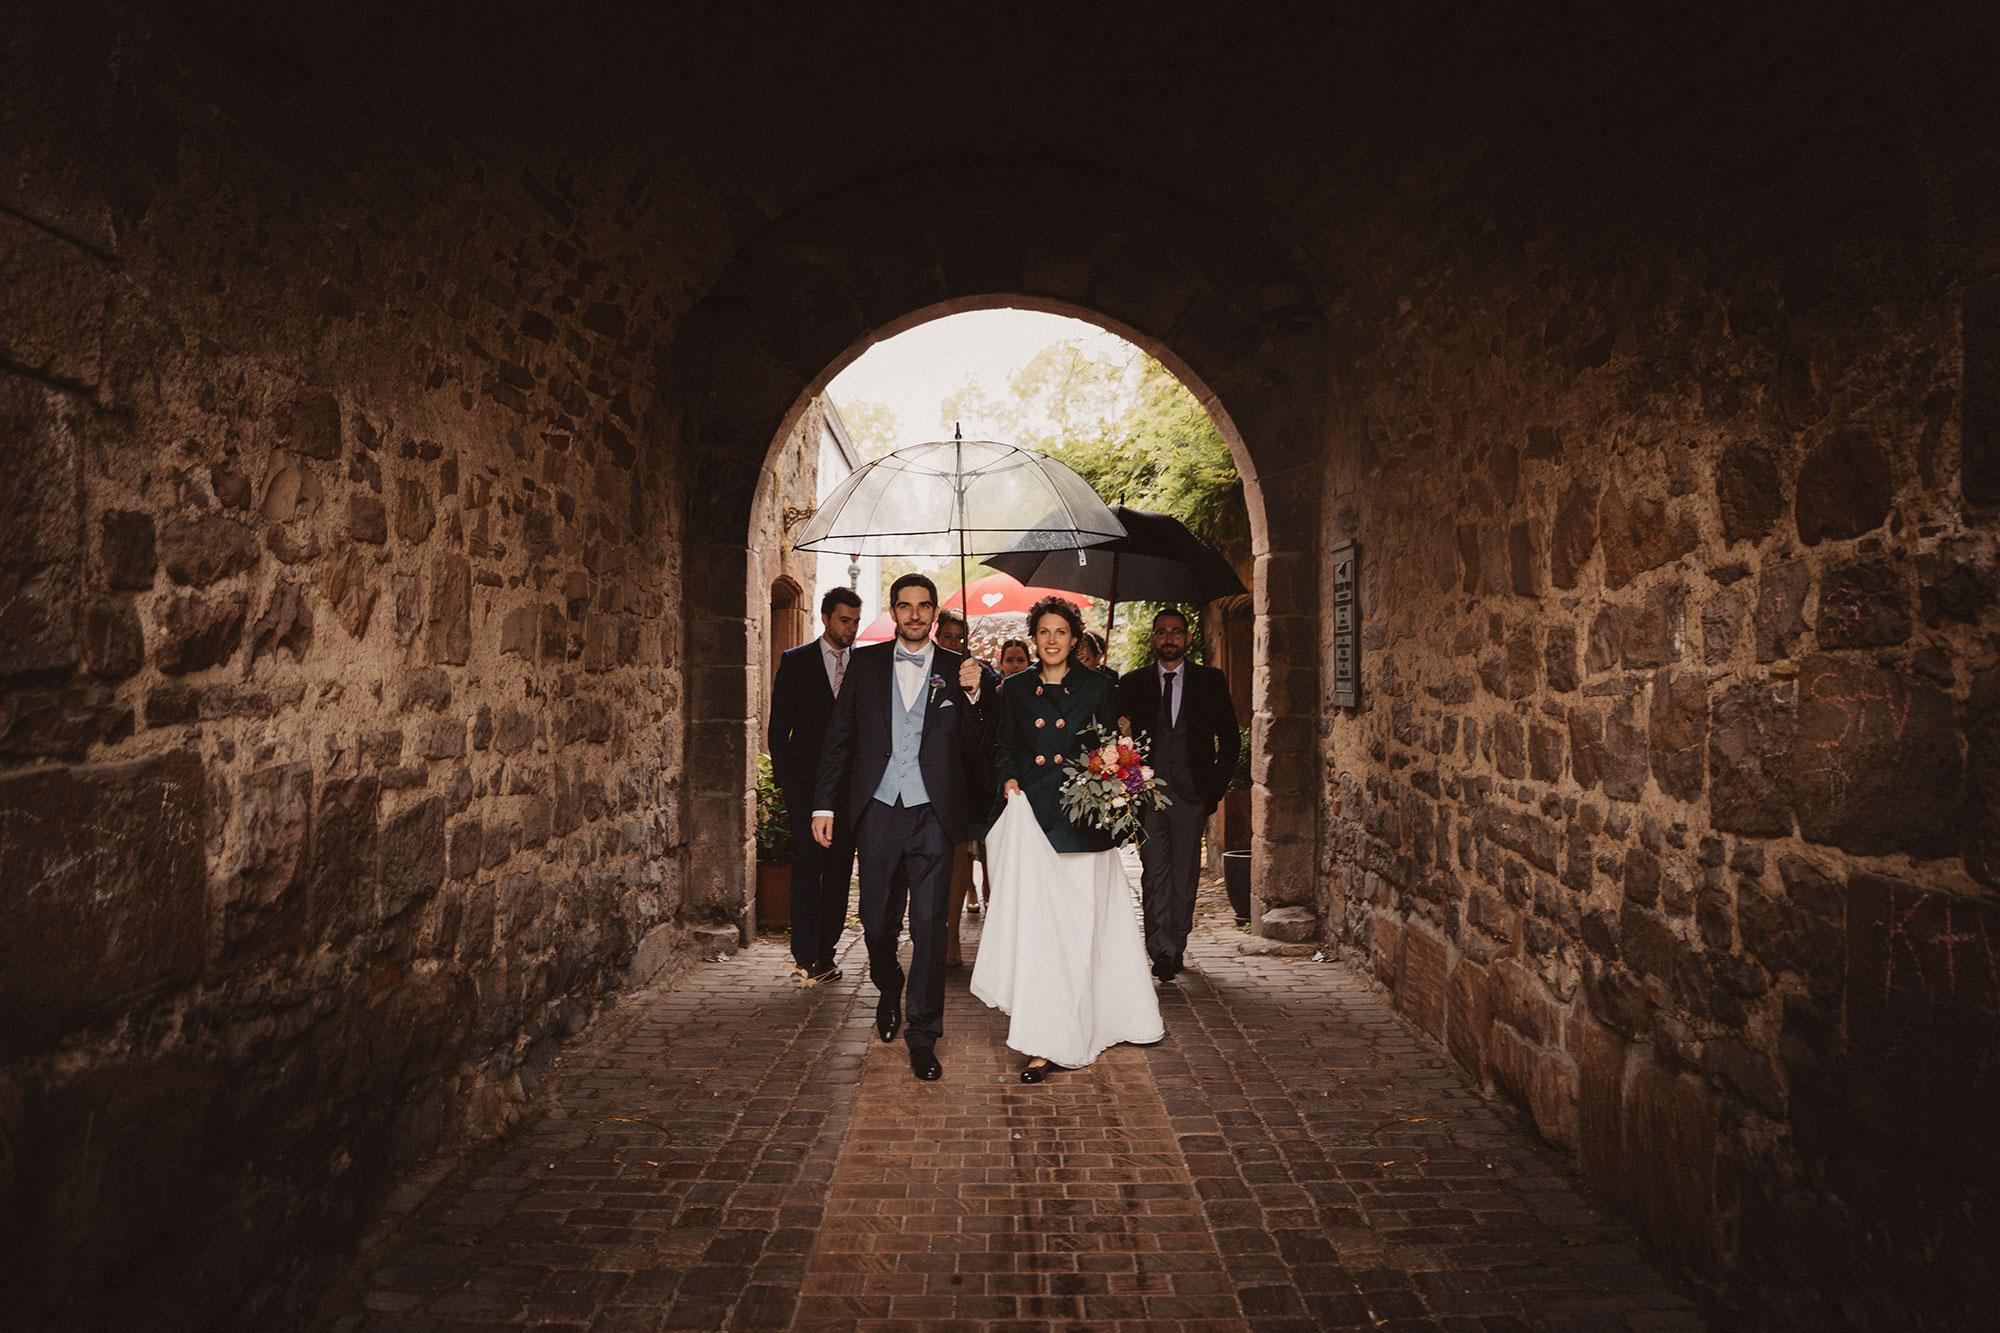 Hochzeitsfotografie-Karlsruhe-Ronja-Flo-9